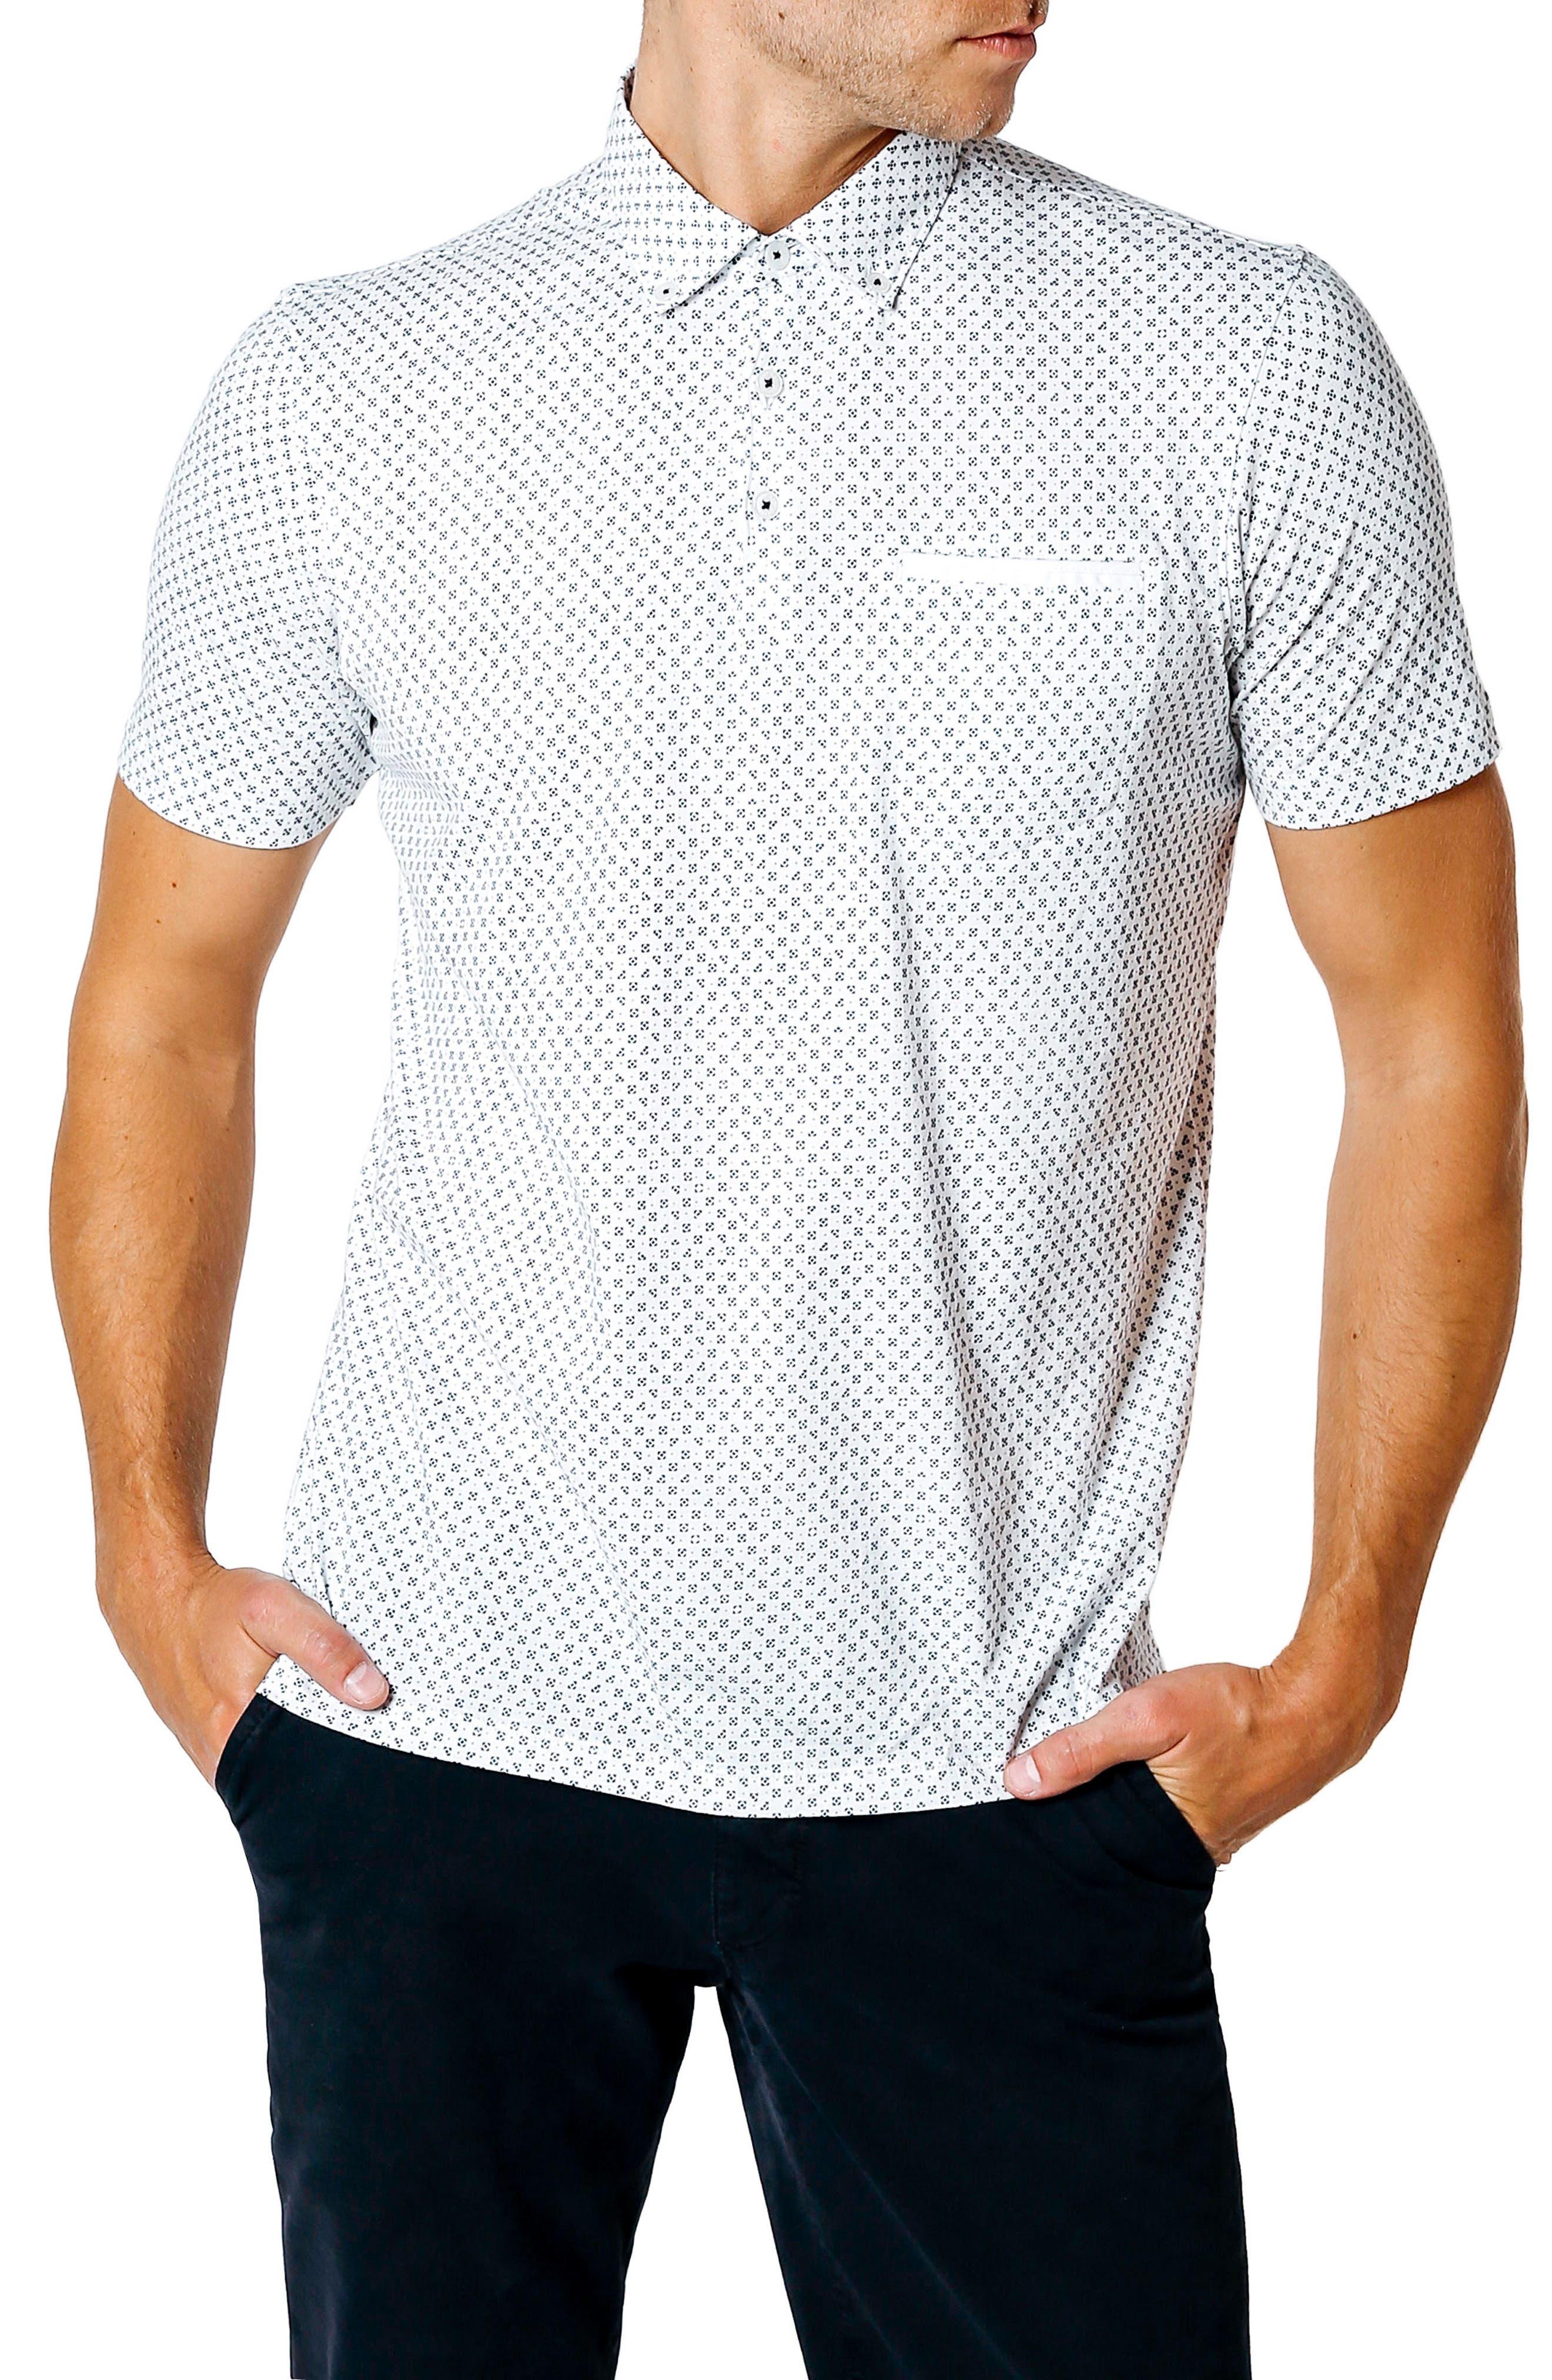 Good Man Brand Premium Slim Fit Polo